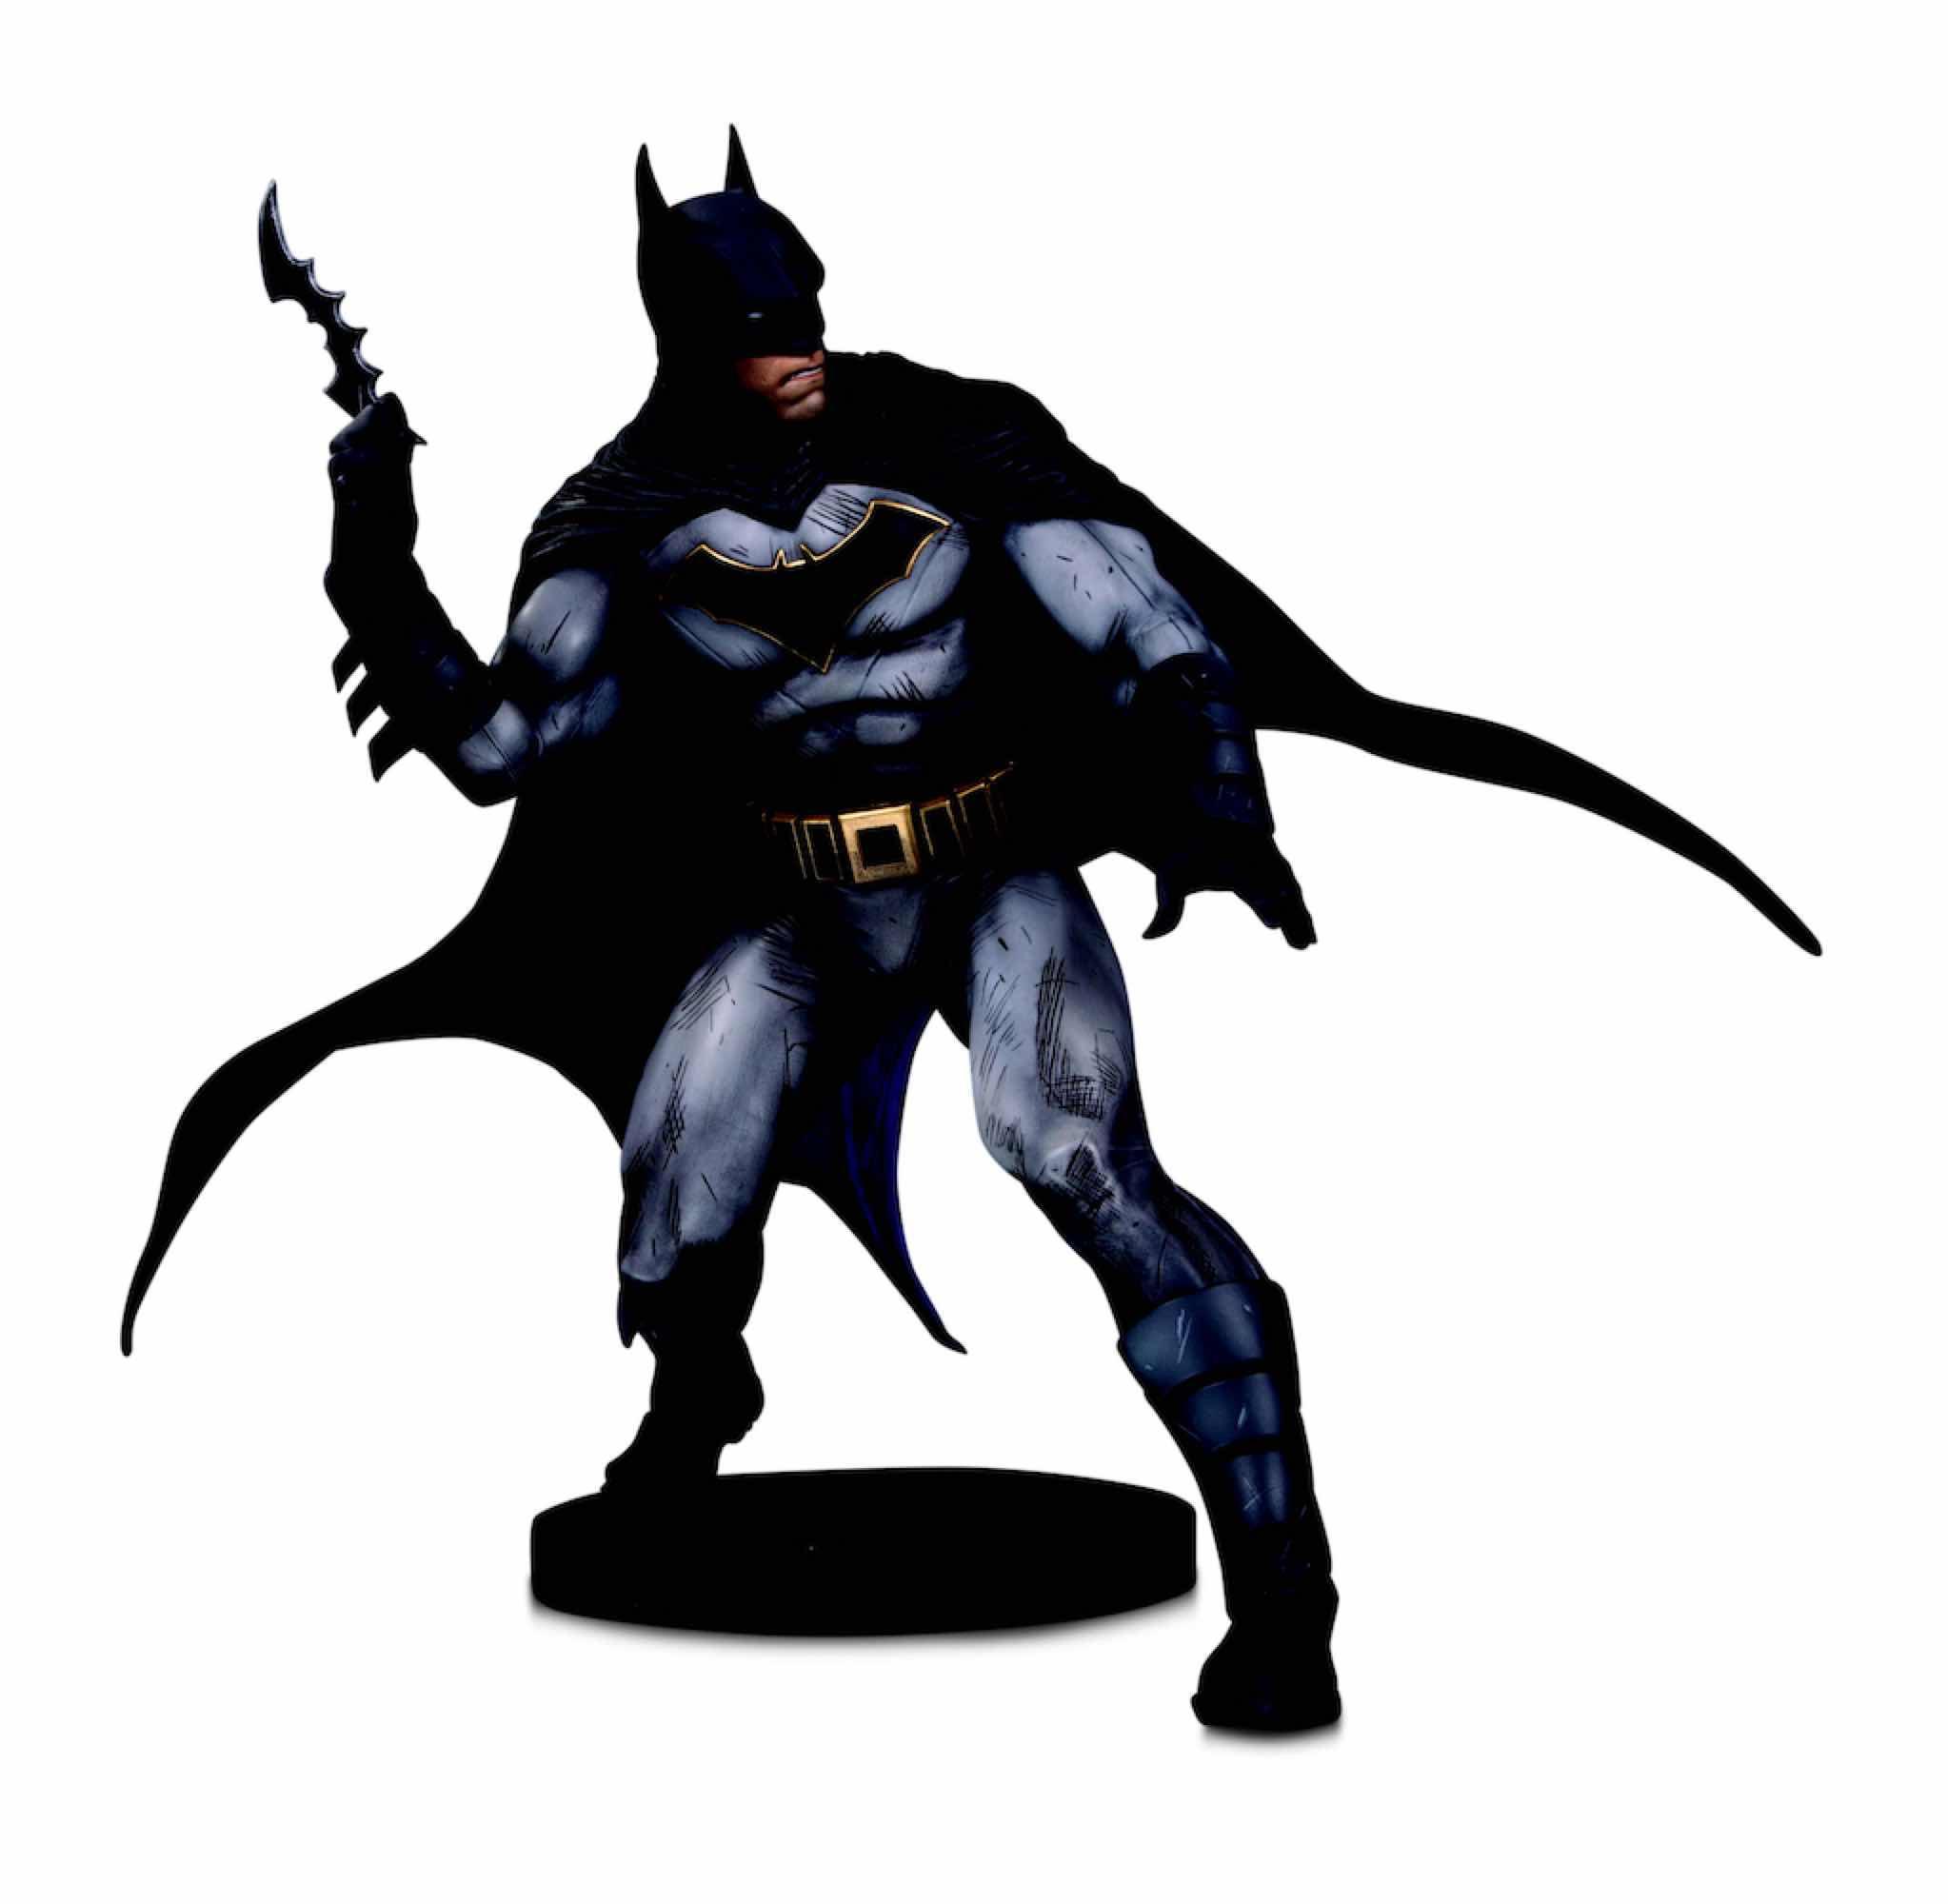 BATMAN BY OLIVIER COIPEL ESTATUA 28 CM BATMAN DC DESIGNER SERIES